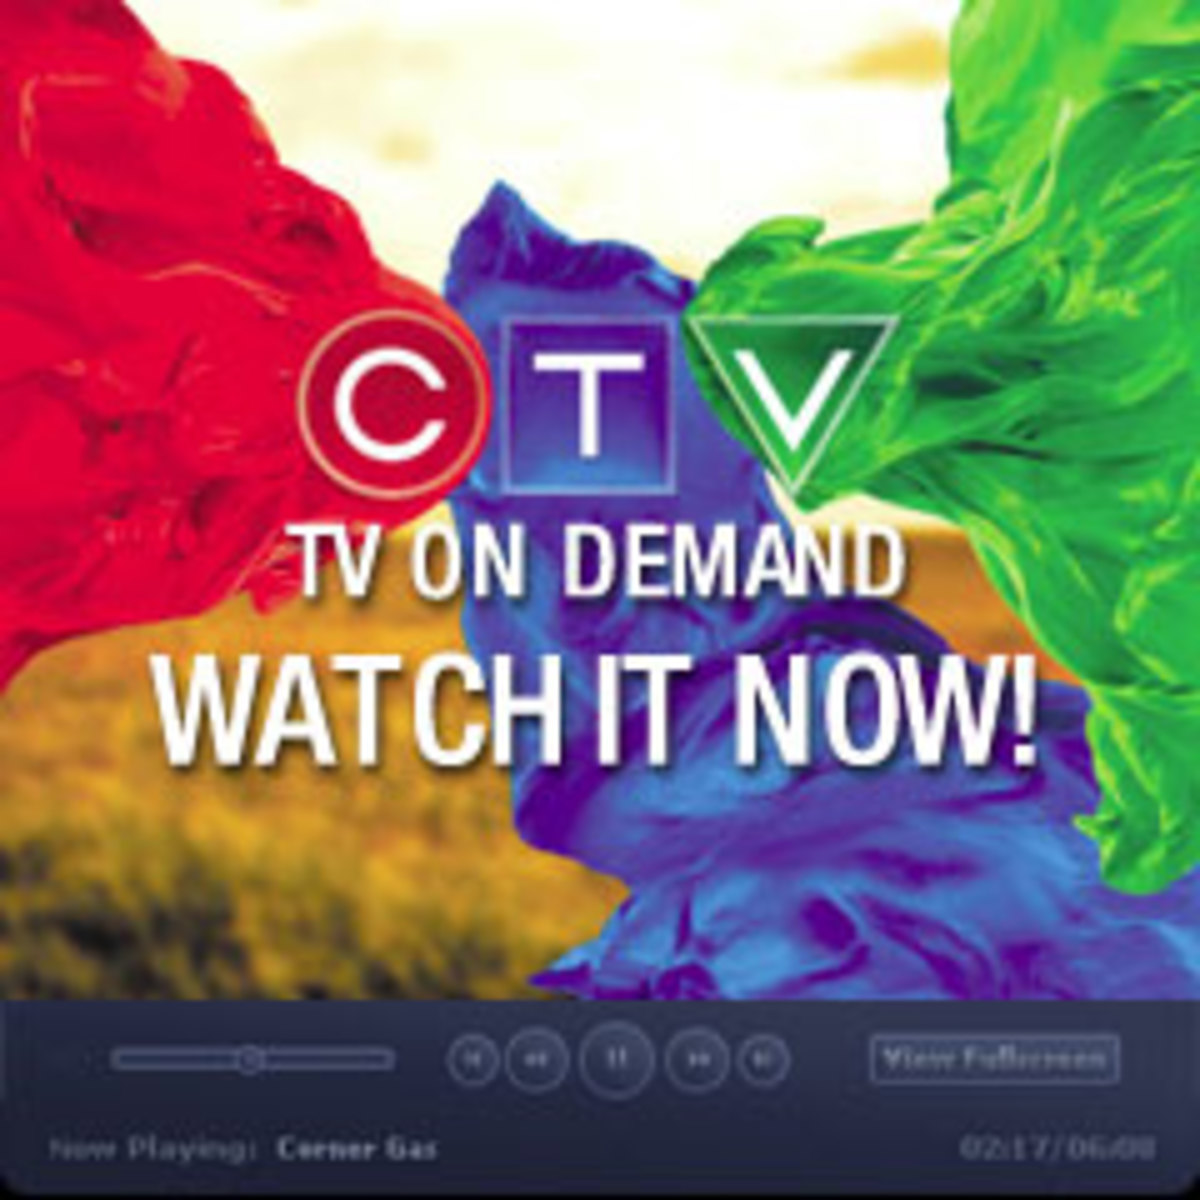 CTV Online - TV On Demand